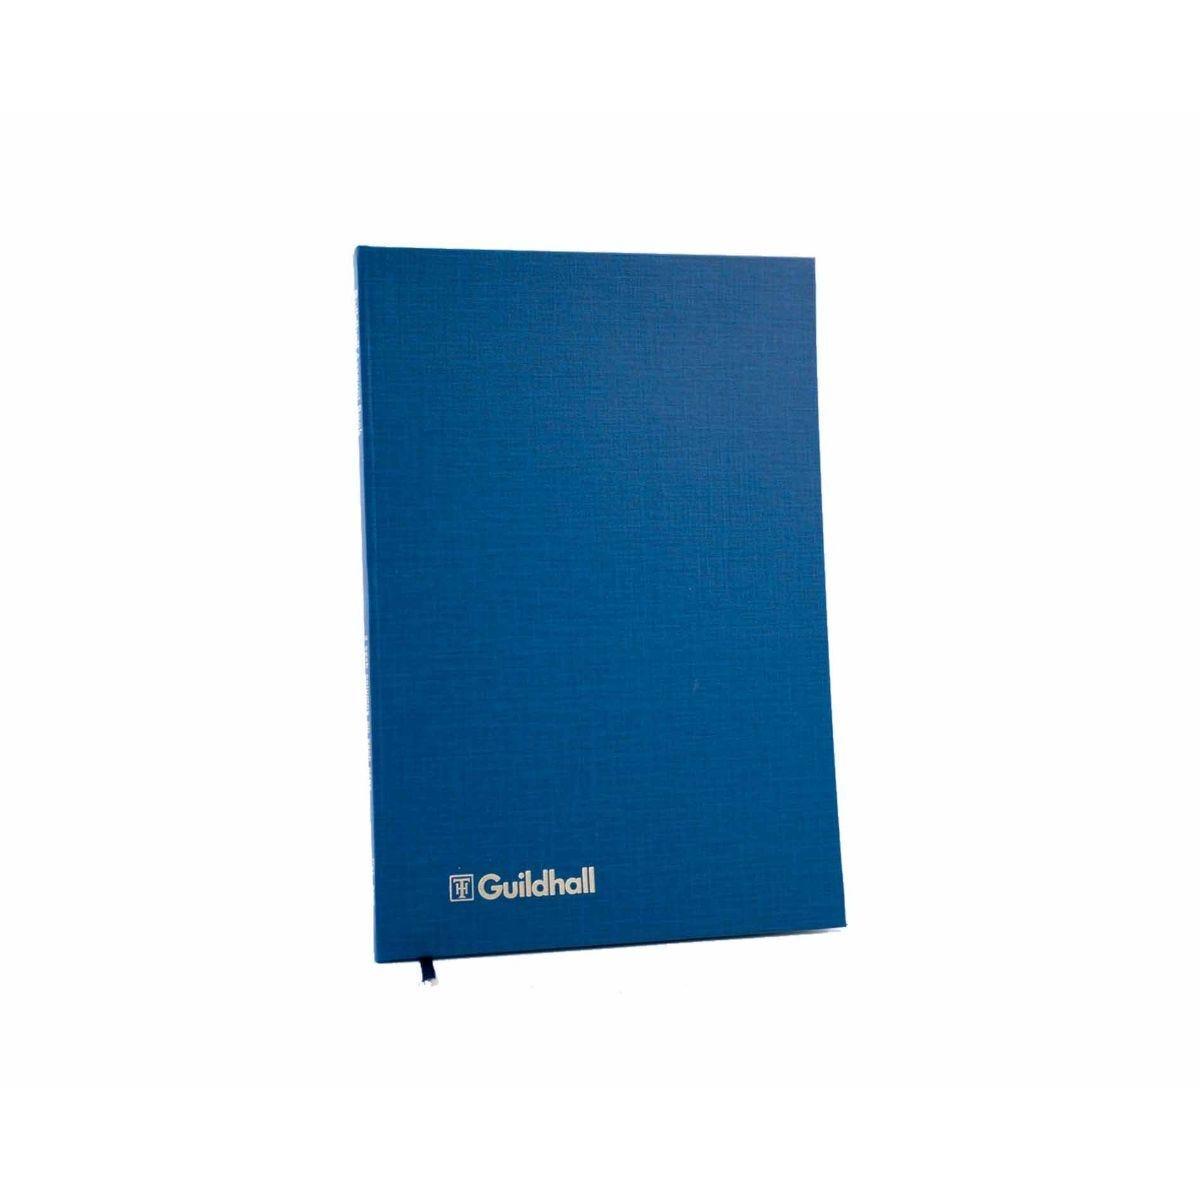 Guildhall Account Book 31 Series 2 Column A4